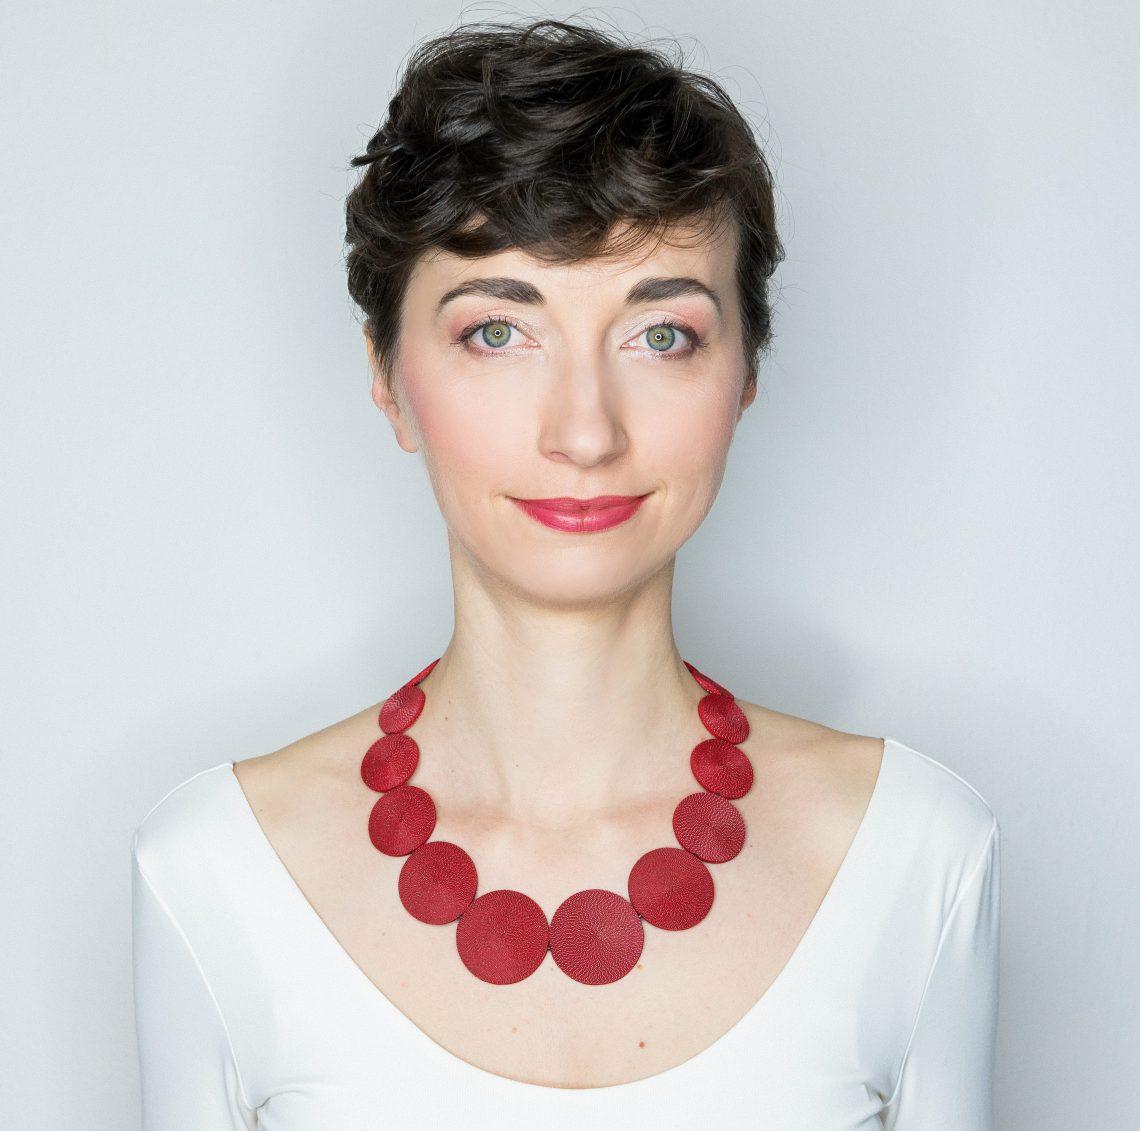 Anke Hennig, Sequence Red, halssieraad. Foto met dank aan Anke Hennig©